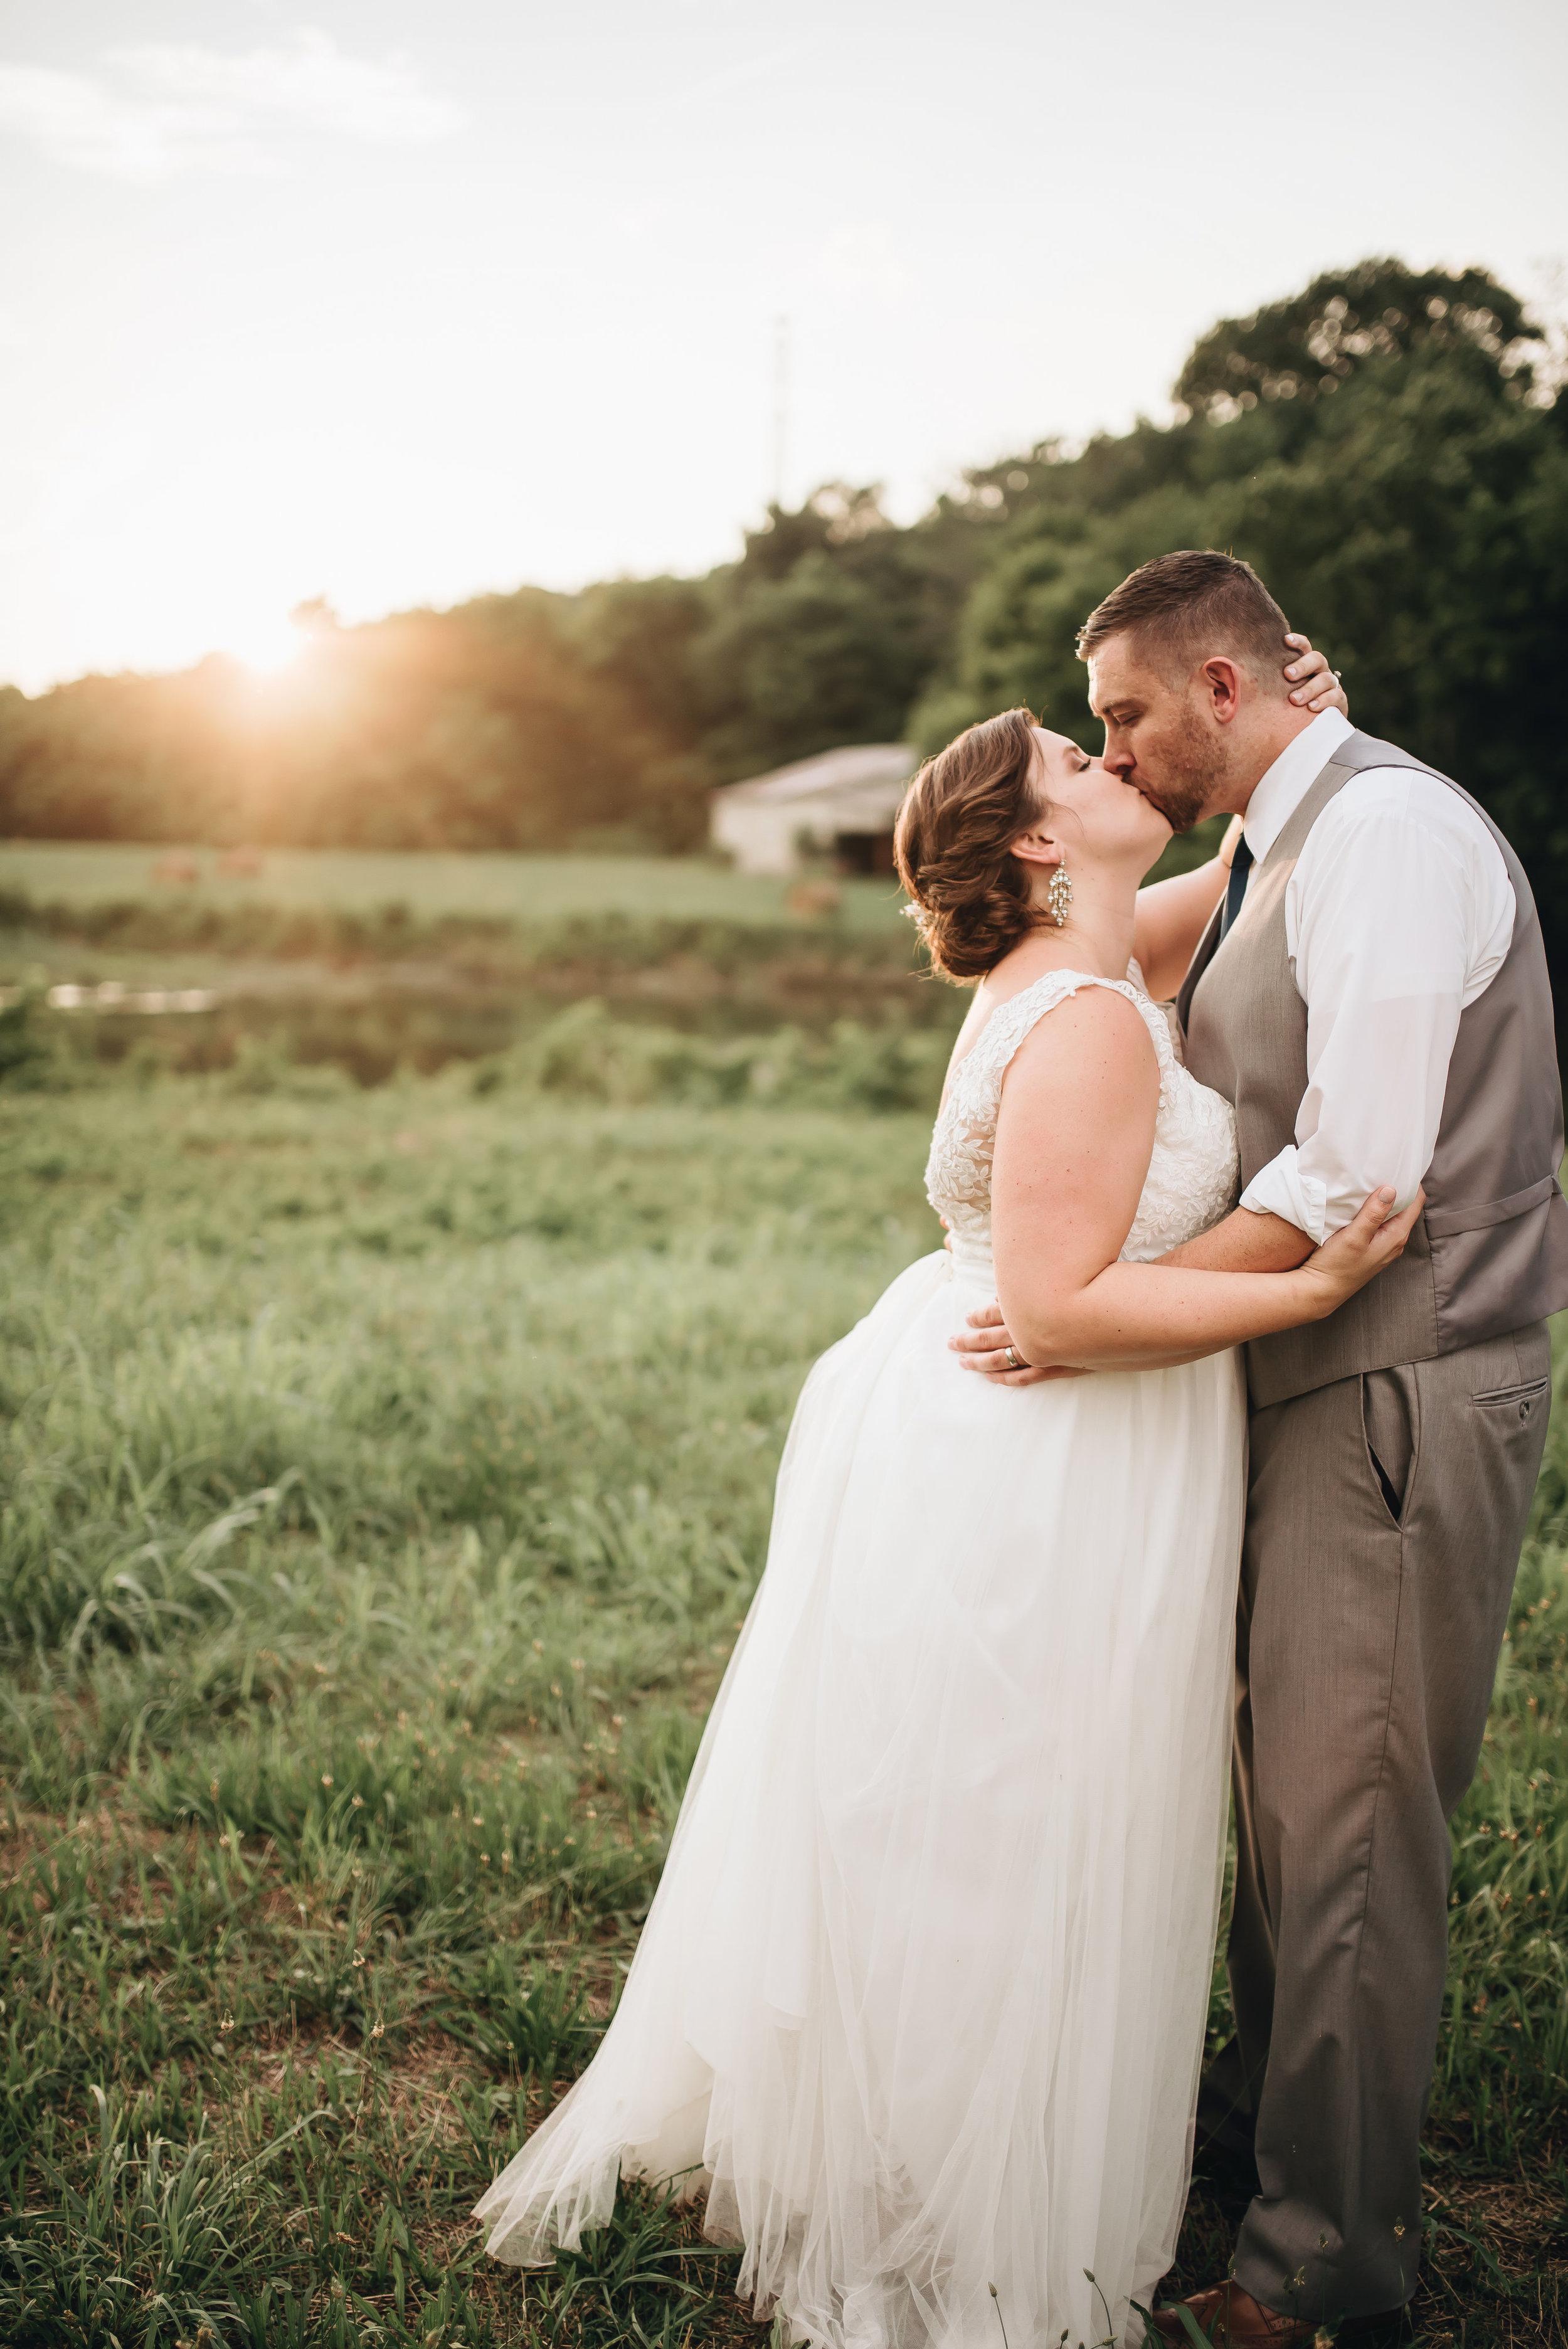 Cara and Shaun Wedding - EDITS-0434.jpg